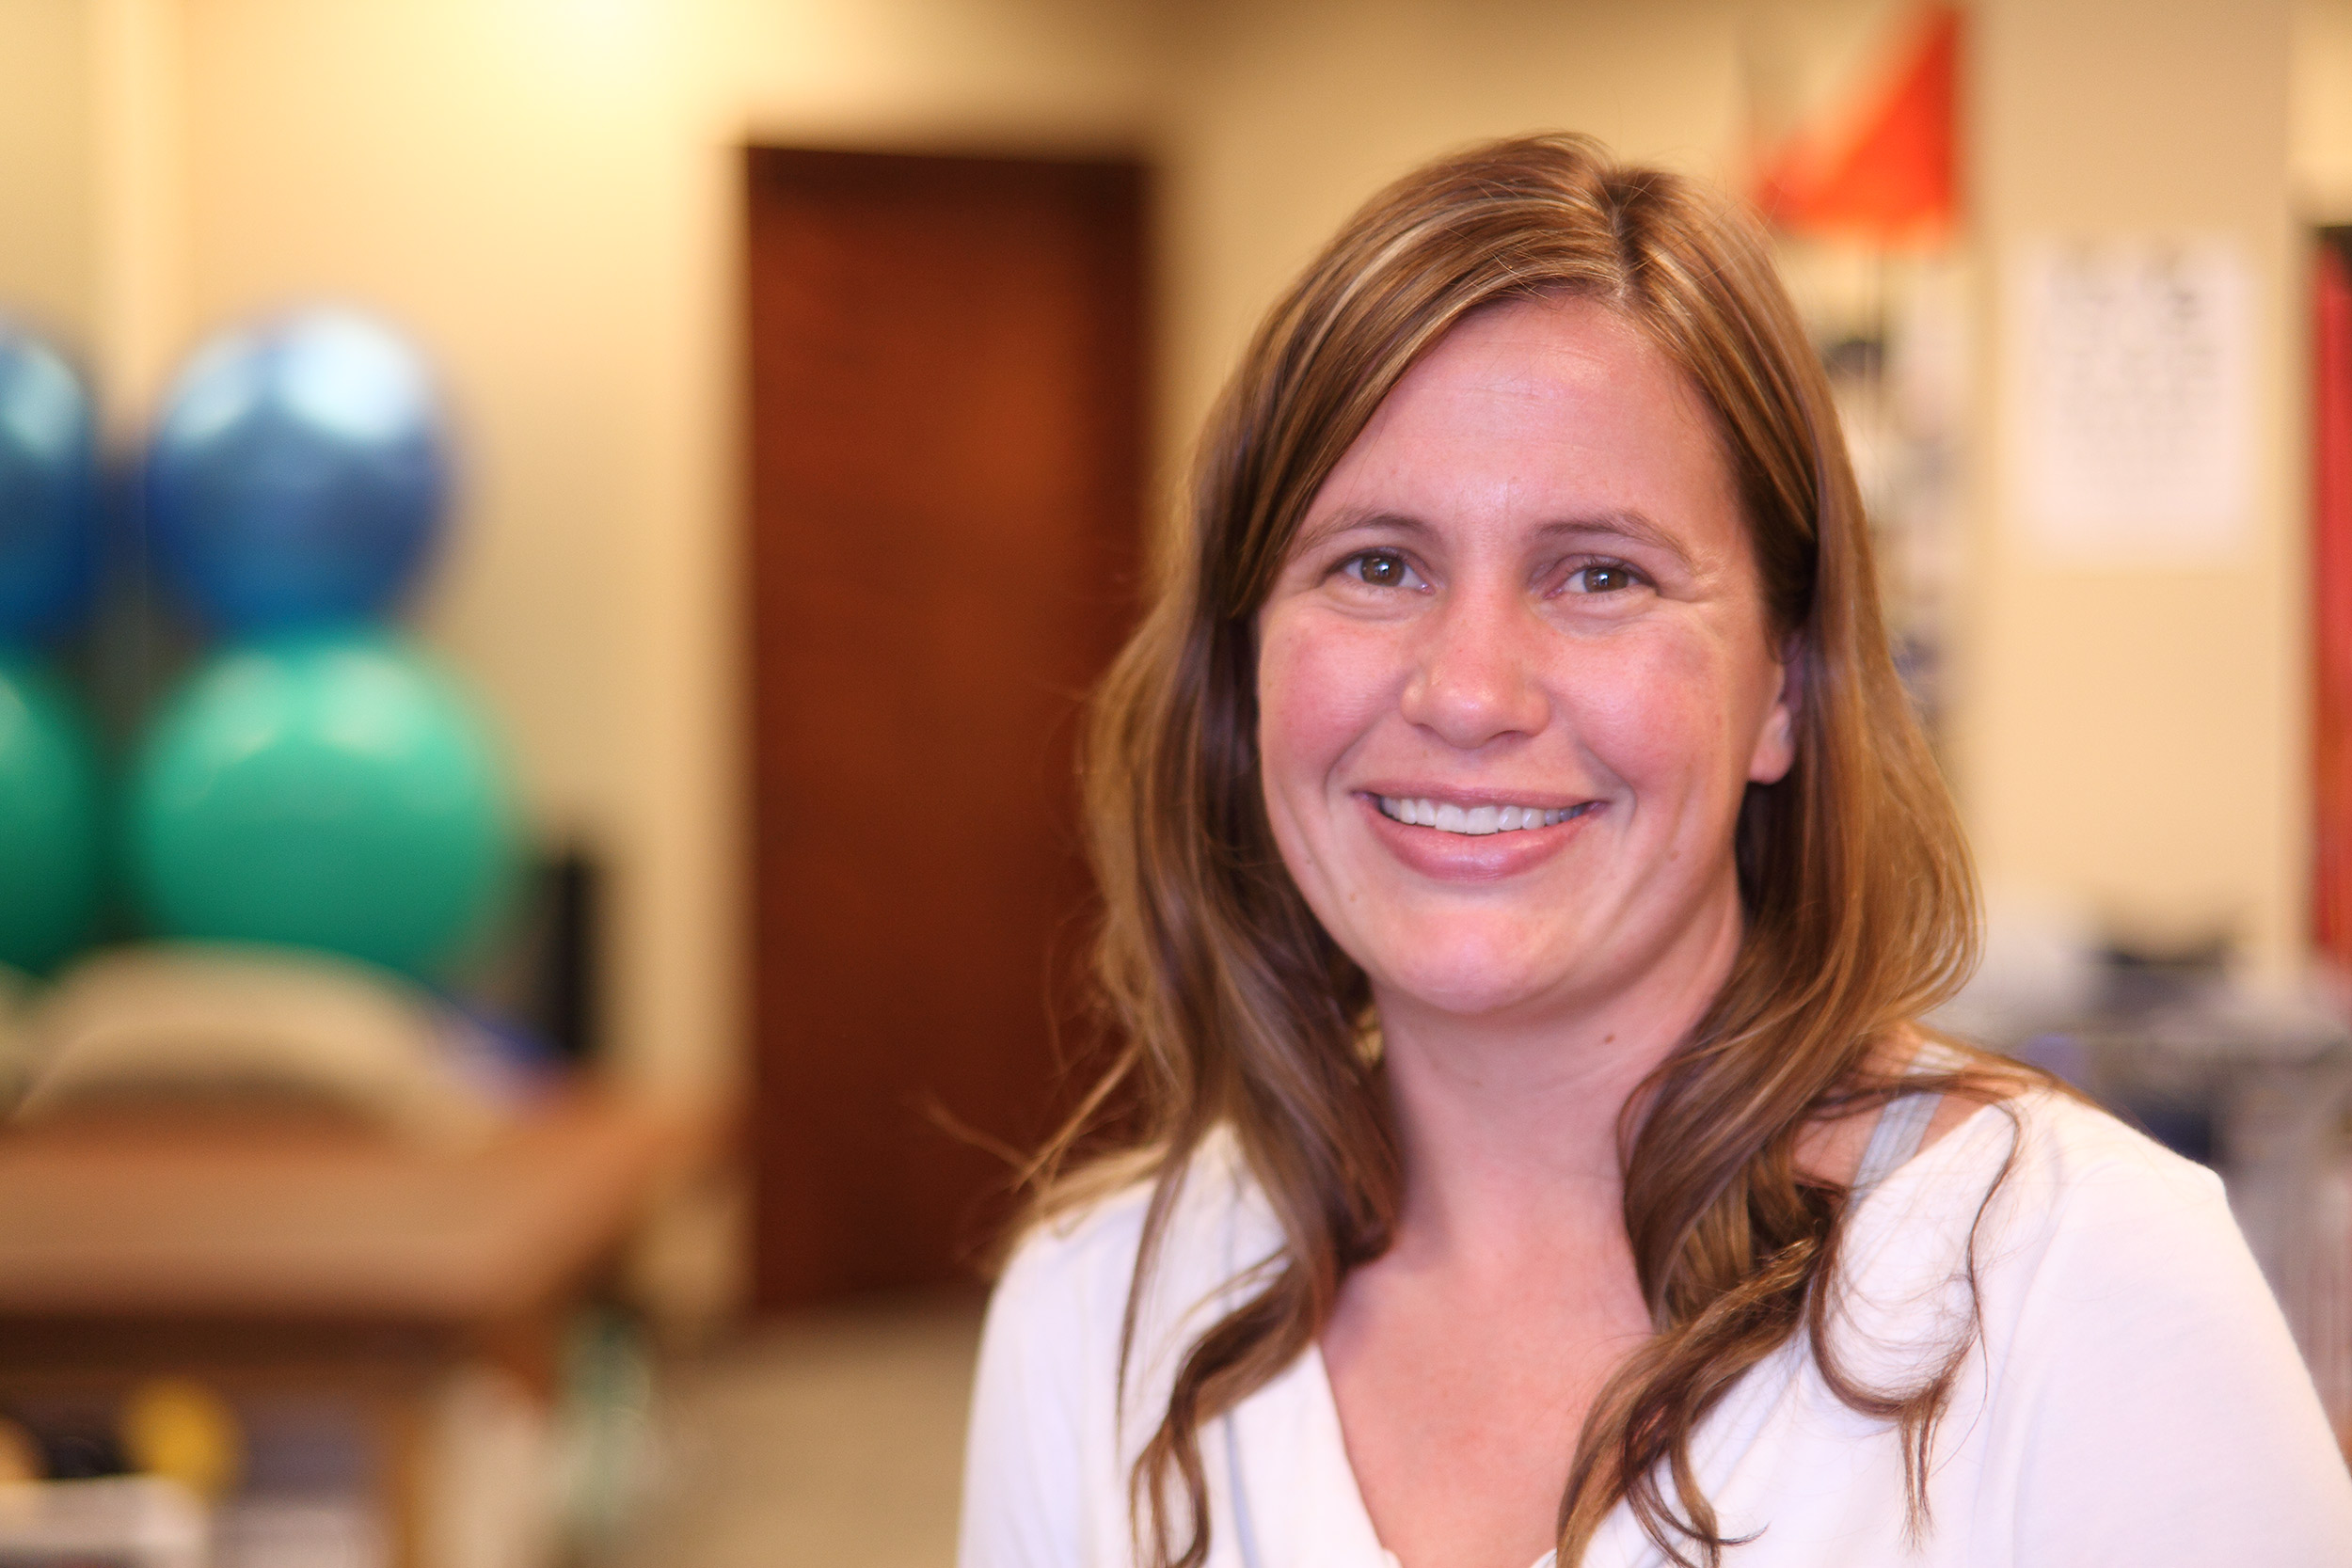 Samantha Jenson, Medical Billing